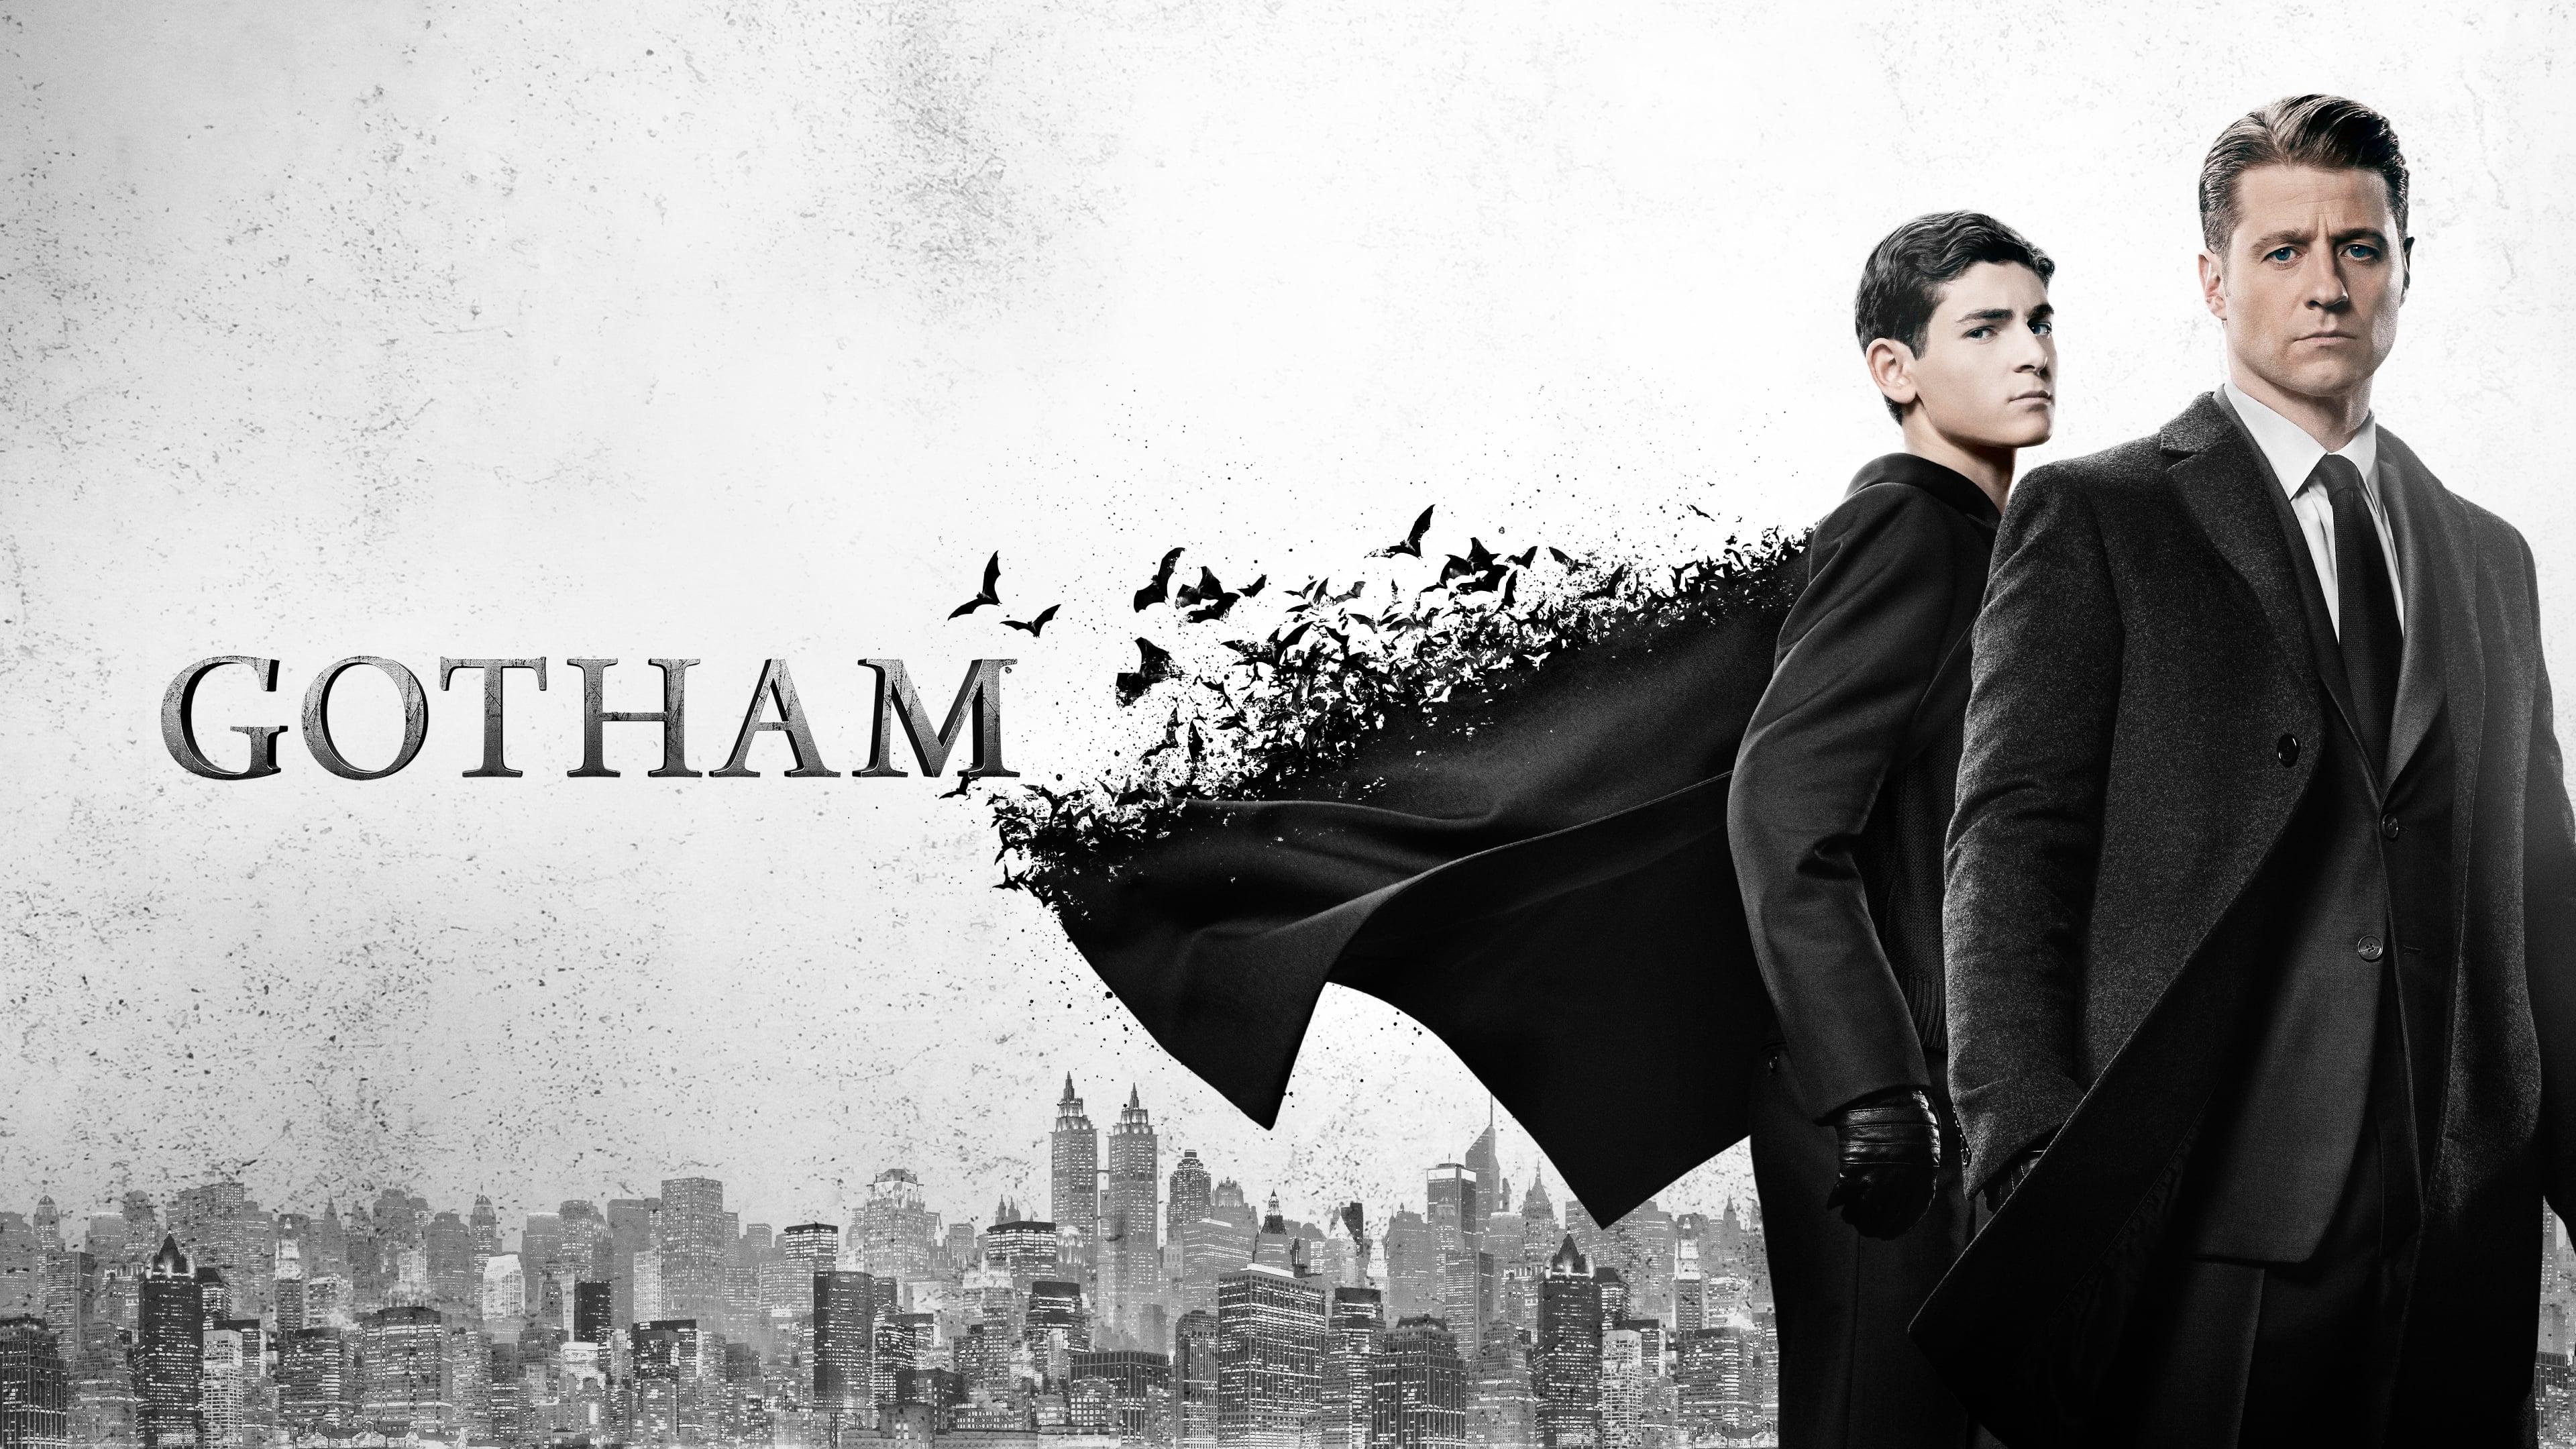 Gotham - Season 0 Episode 6 : Aftermath: Barbara